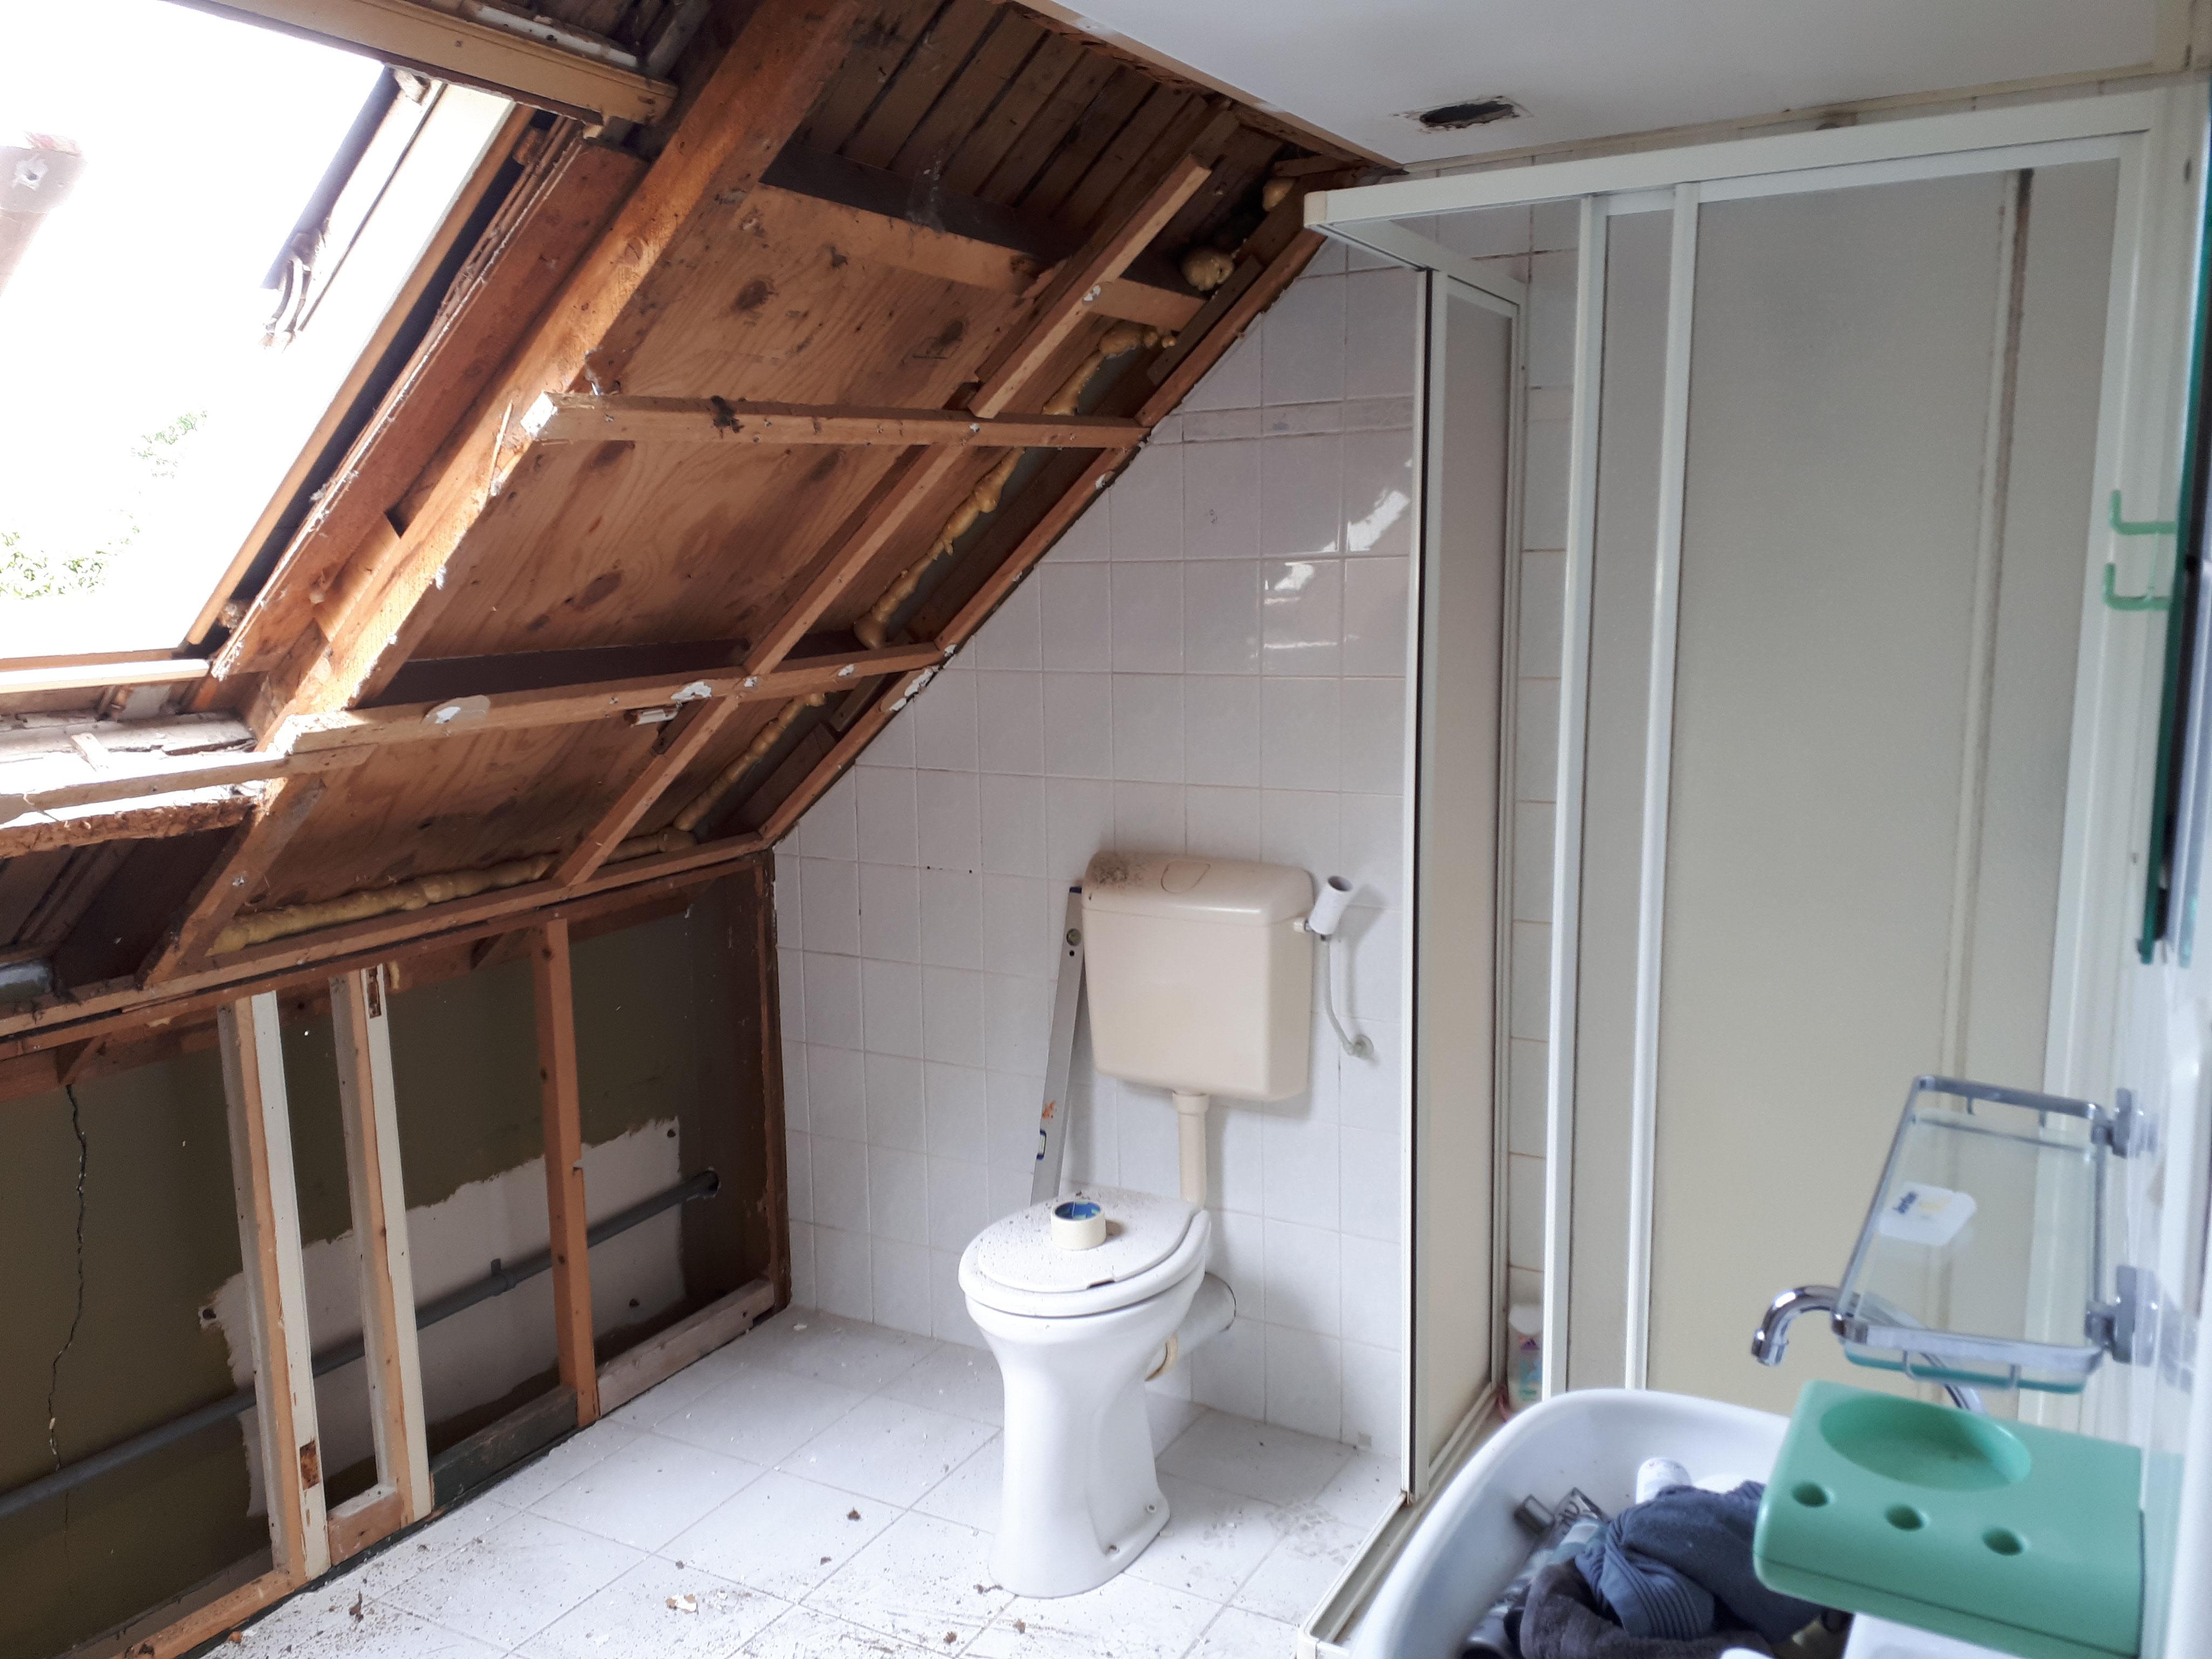 Badkamer Met Dakkapel : Plaatsen dakkapel nieuwe badkamer te kwadendamme j f peeters zn